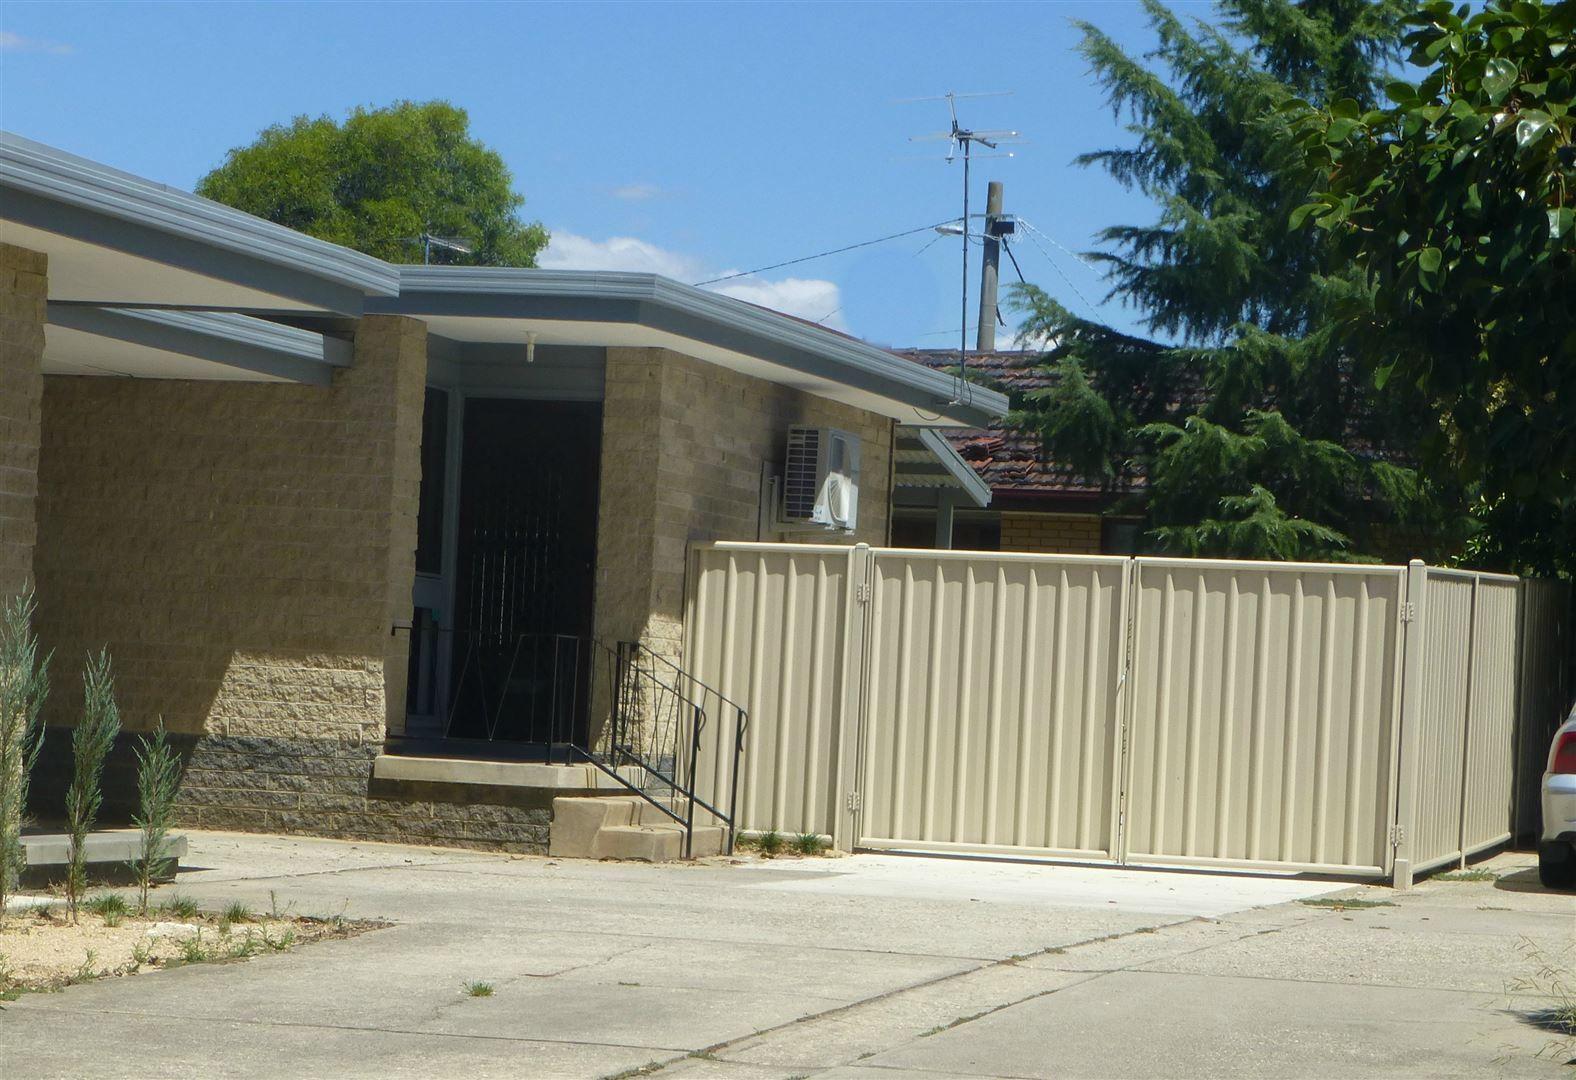 2/137 Lawrence Street, Wodonga VIC 3690, Image 0